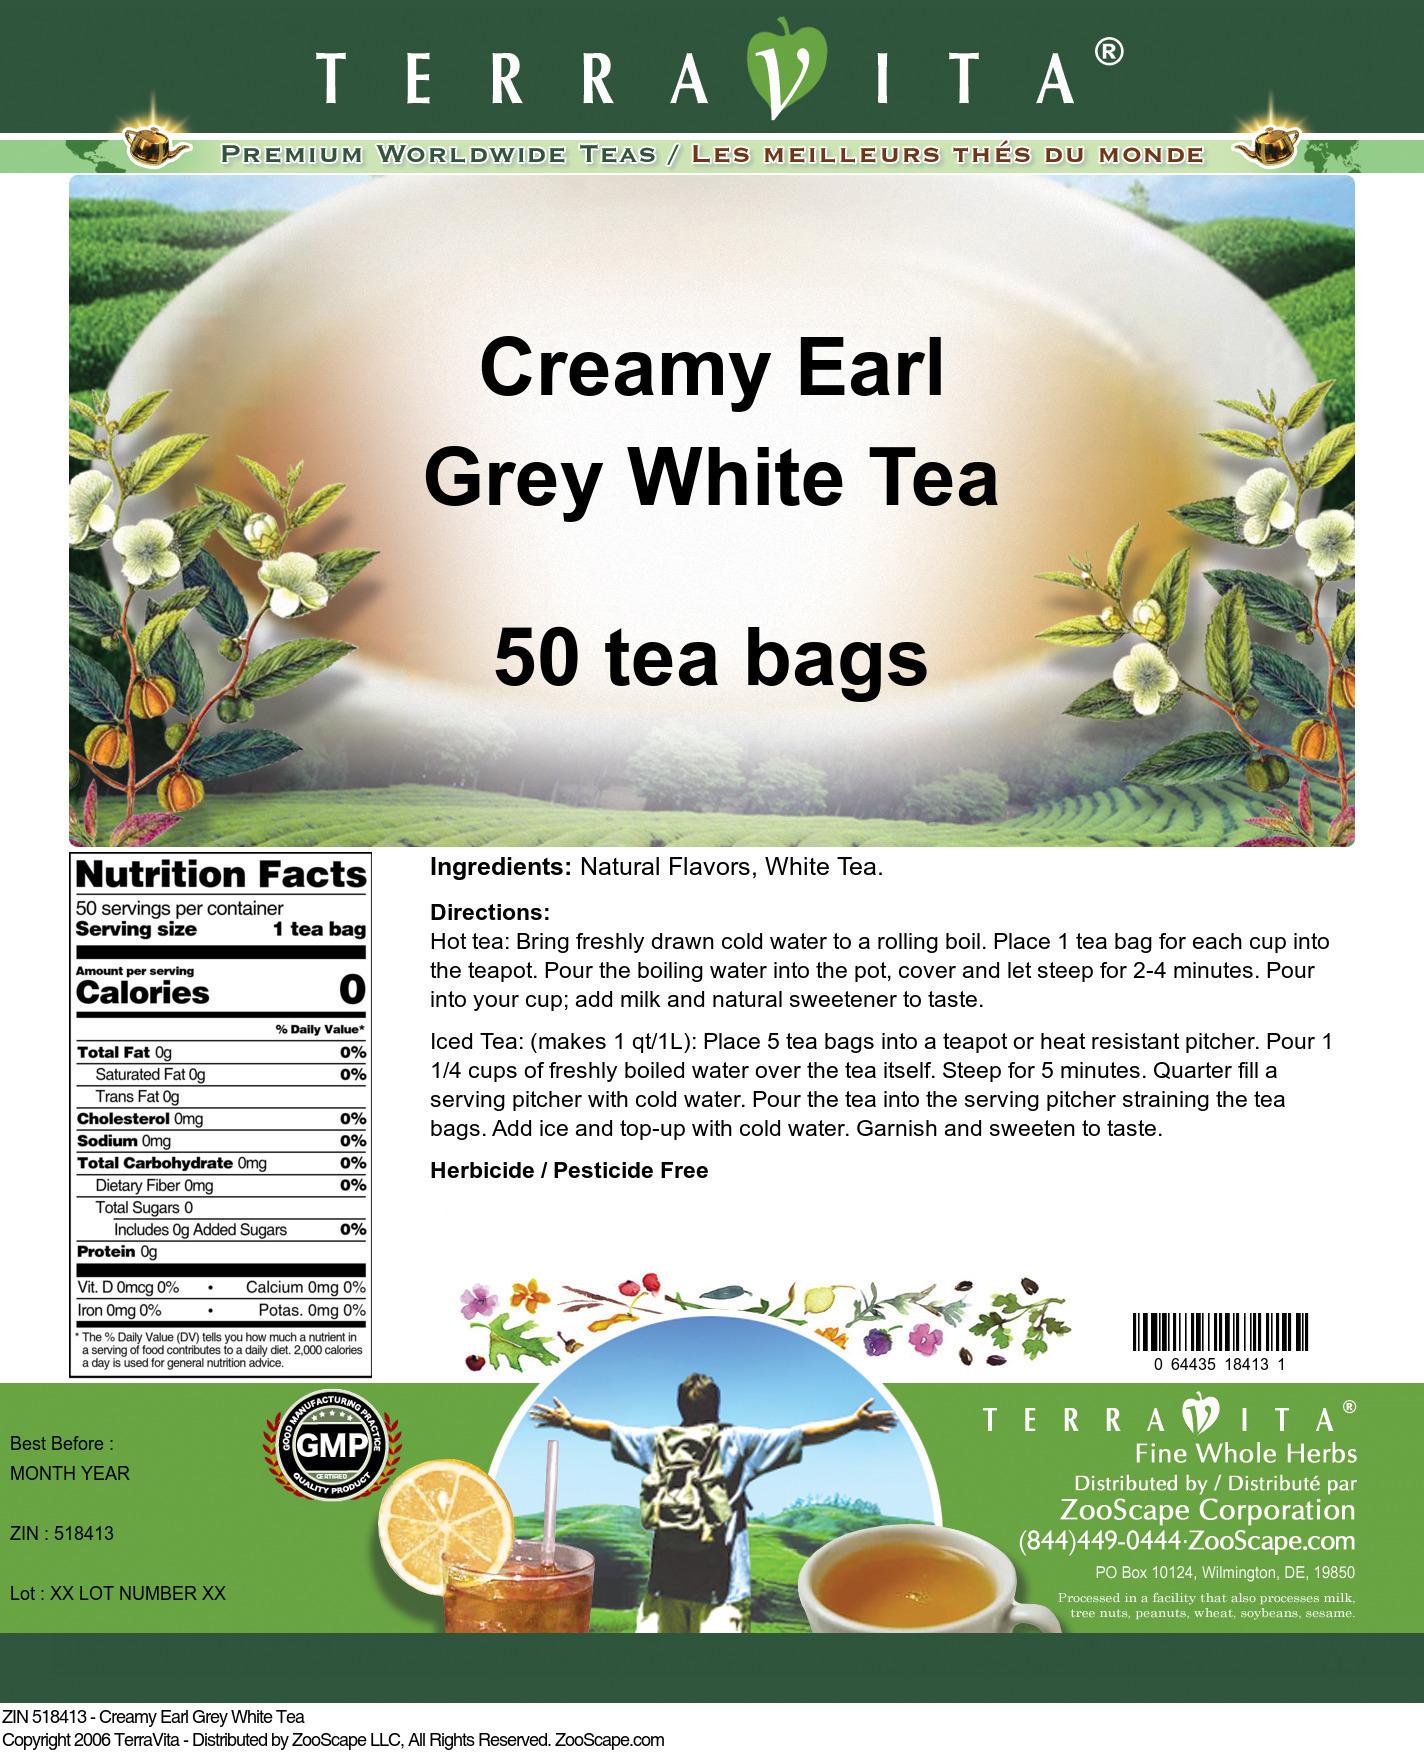 Creamy Earl Grey White Tea